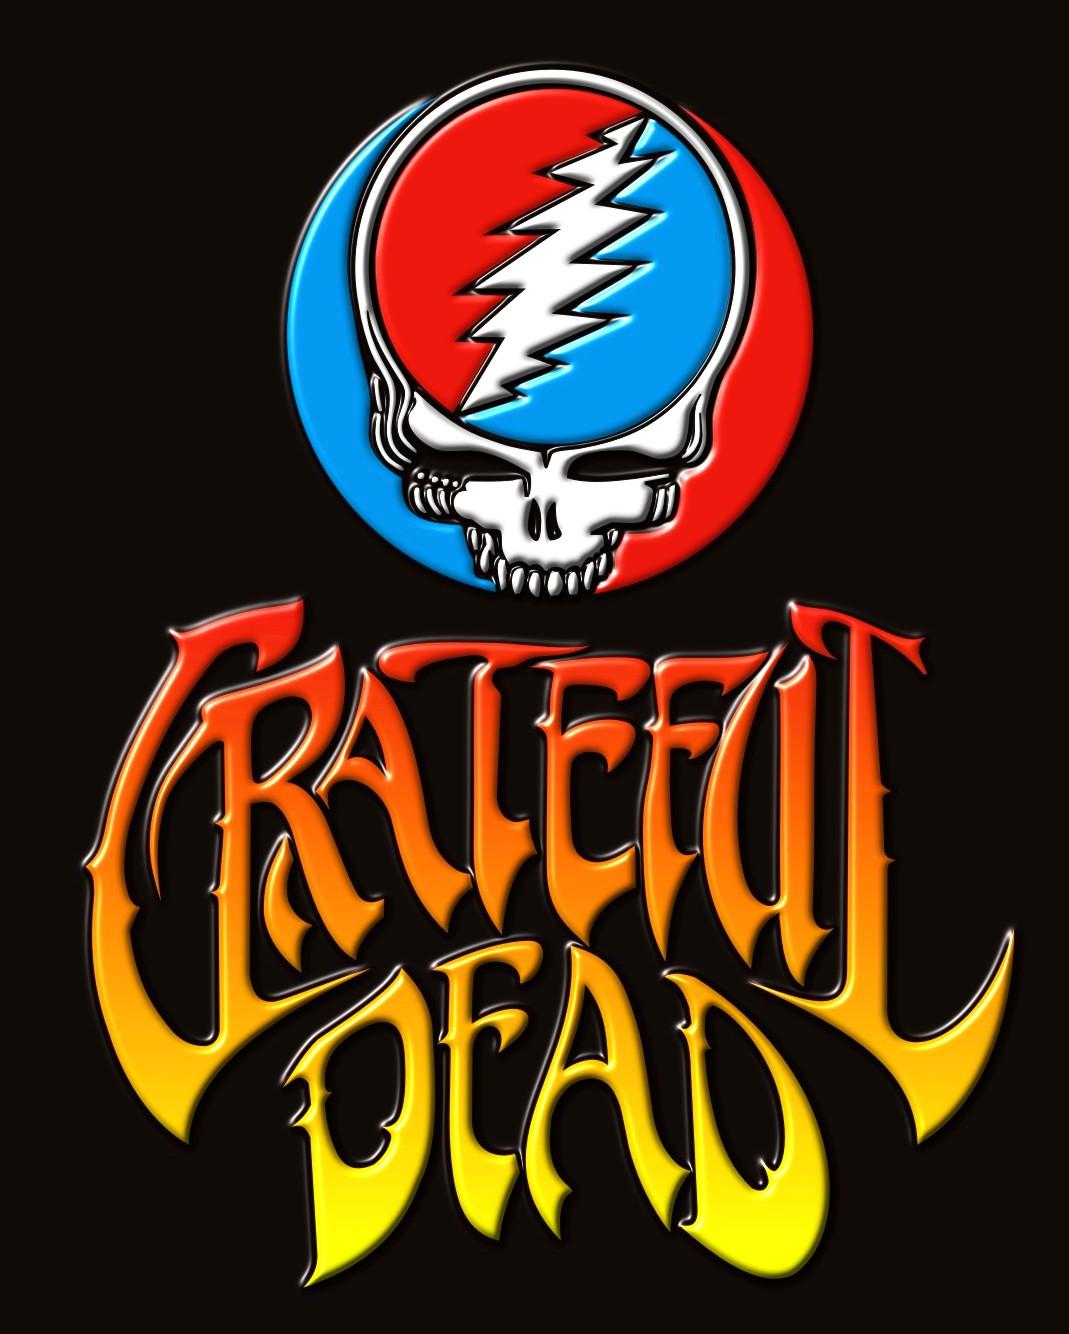 http://3.bp.blogspot.com/_rCR165TDj4Q/S_aU01xb_HI/AAAAAAAAAjI/1yBD2S0_Jds/s1600/Grateful+Dead+logo.jpg